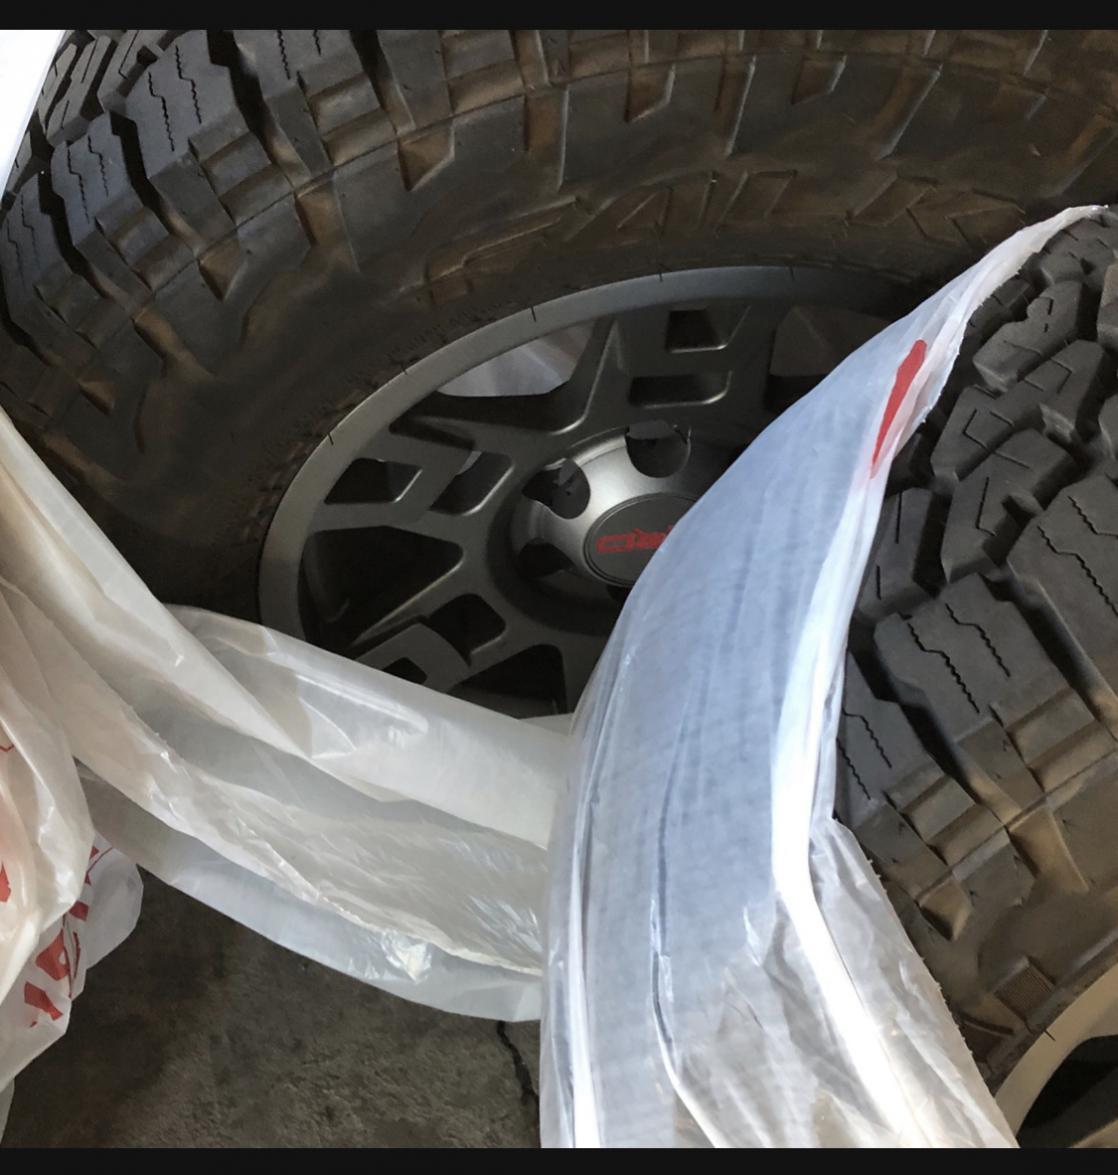 TRD pro Wheels/ Falken Wildpeak AT3275/70/17/ Spider traxx wheel spacers.  SOLD-03bb2b10-43cf-498c-ba33-01e9b3d1abeb-jpg